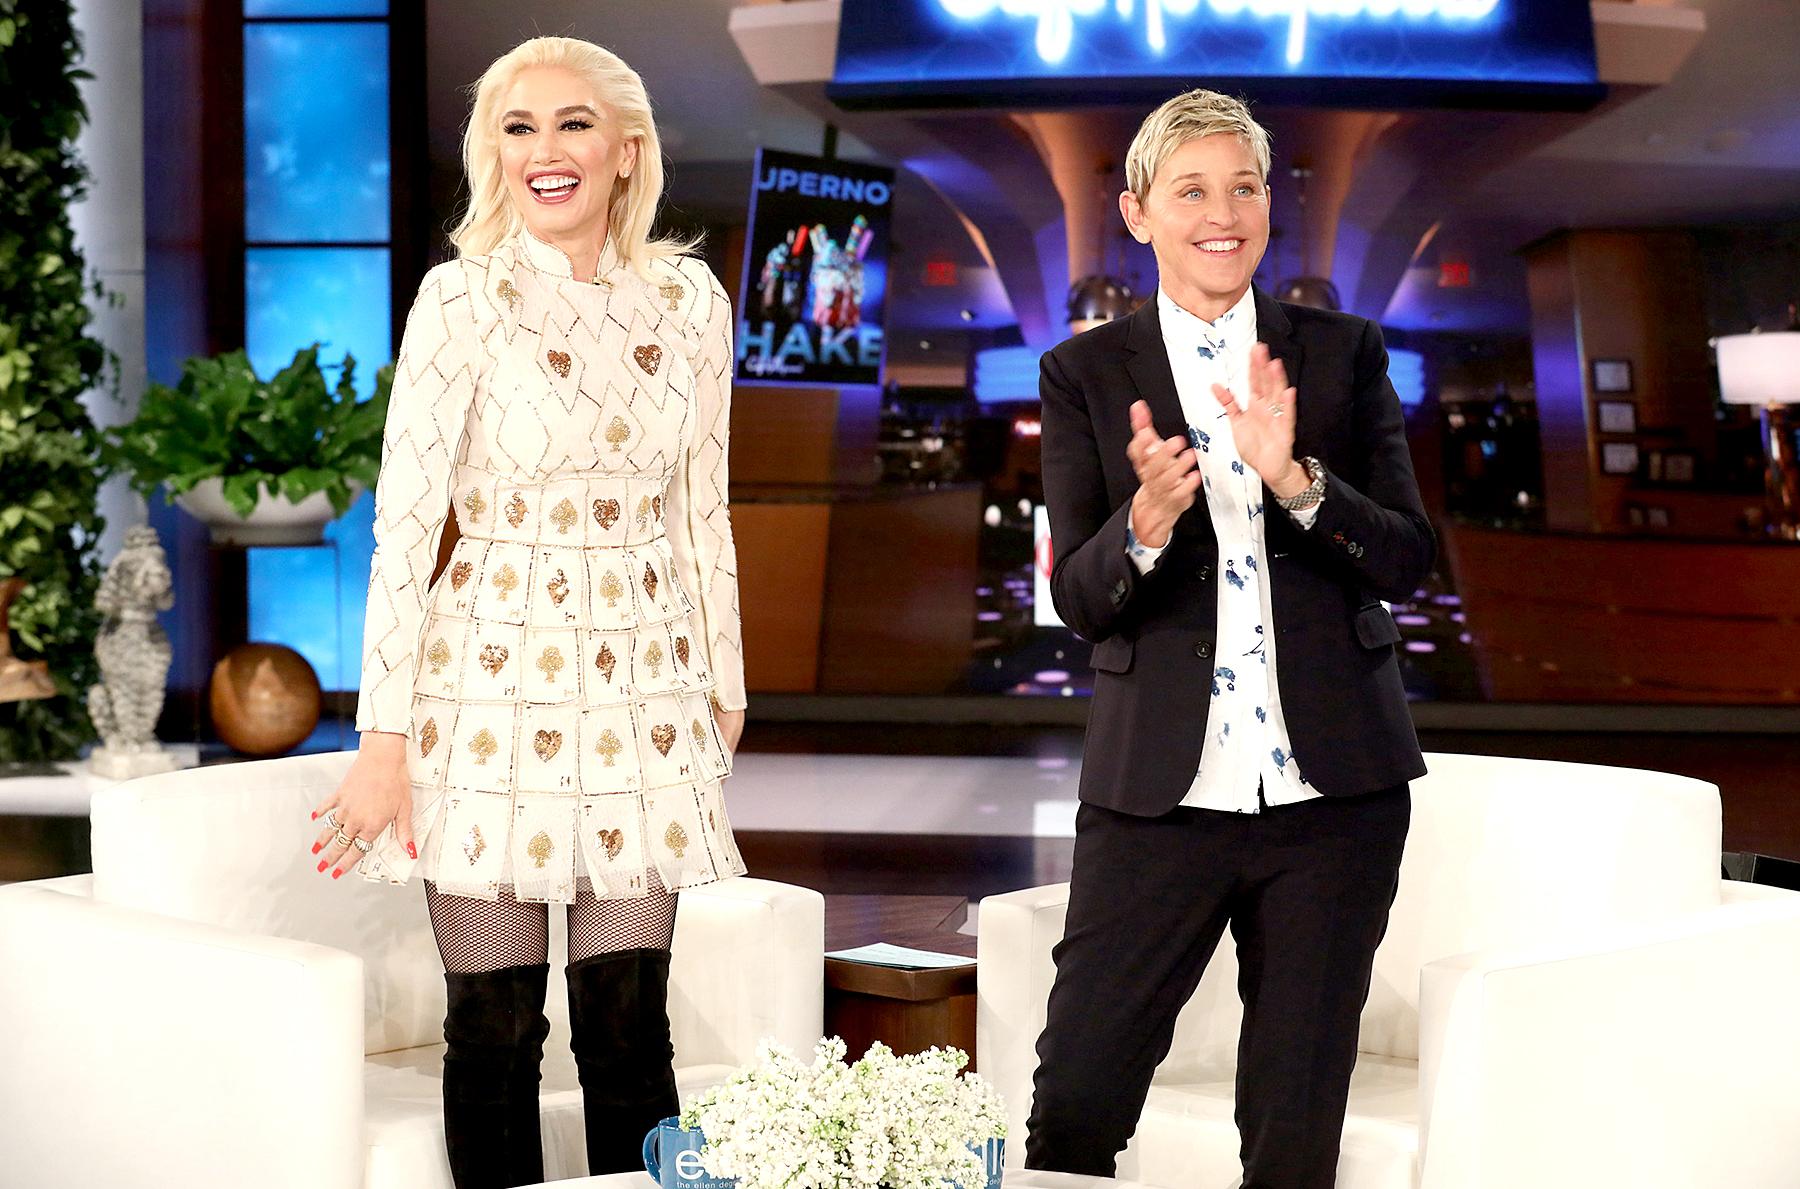 Gwen Stefani Is Plotting Her 'Sweet Escape' To Vegas For New Residency